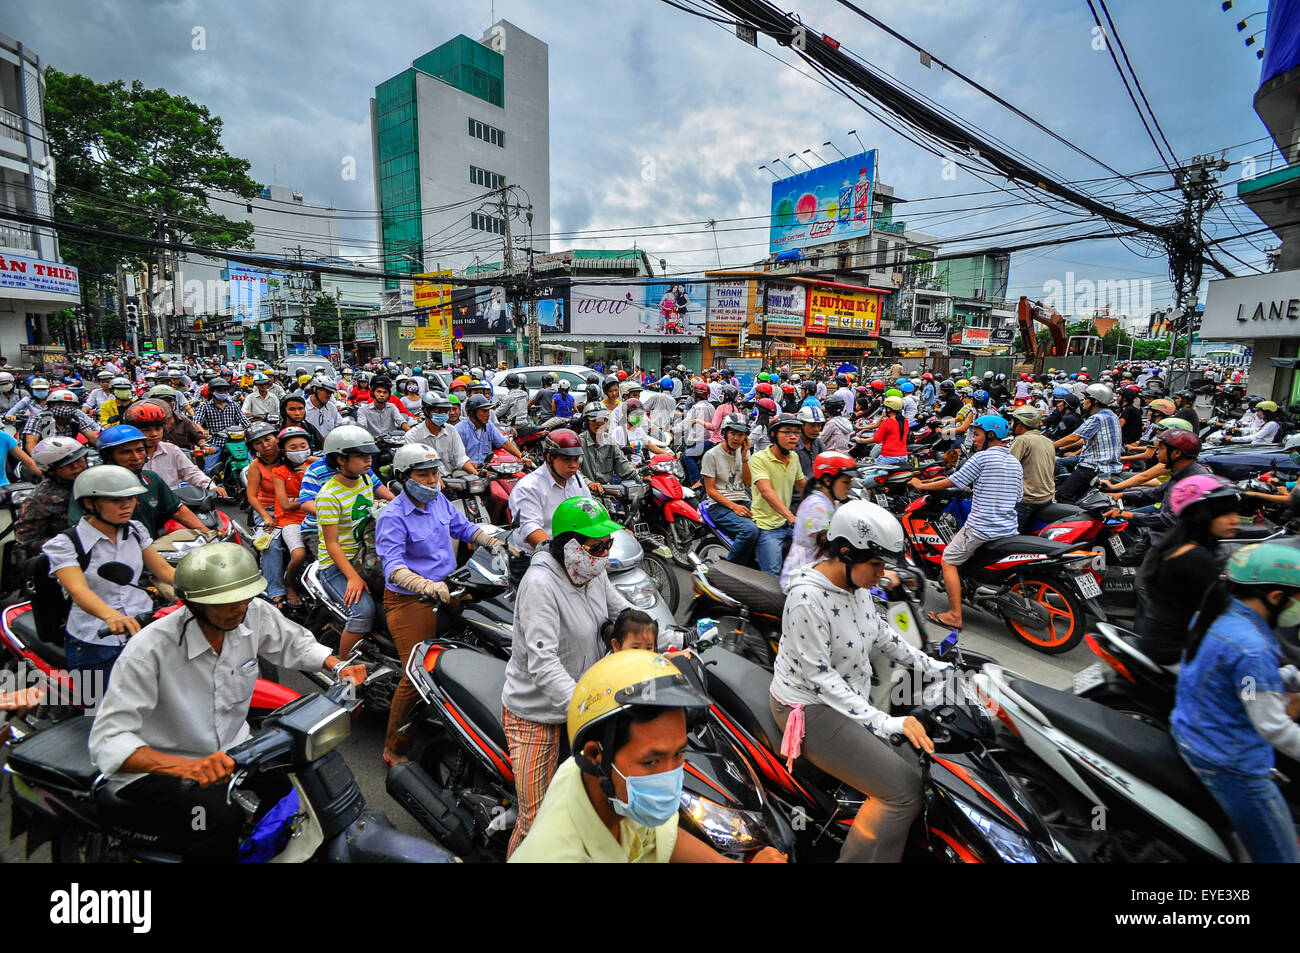 A Saigon, Vietnam - 15 Giugno: traffico stradale su Giugno 15, 2011 a Saigon (Ho Chi Minh City), Vietnam. Ho Chi Immagini Stock